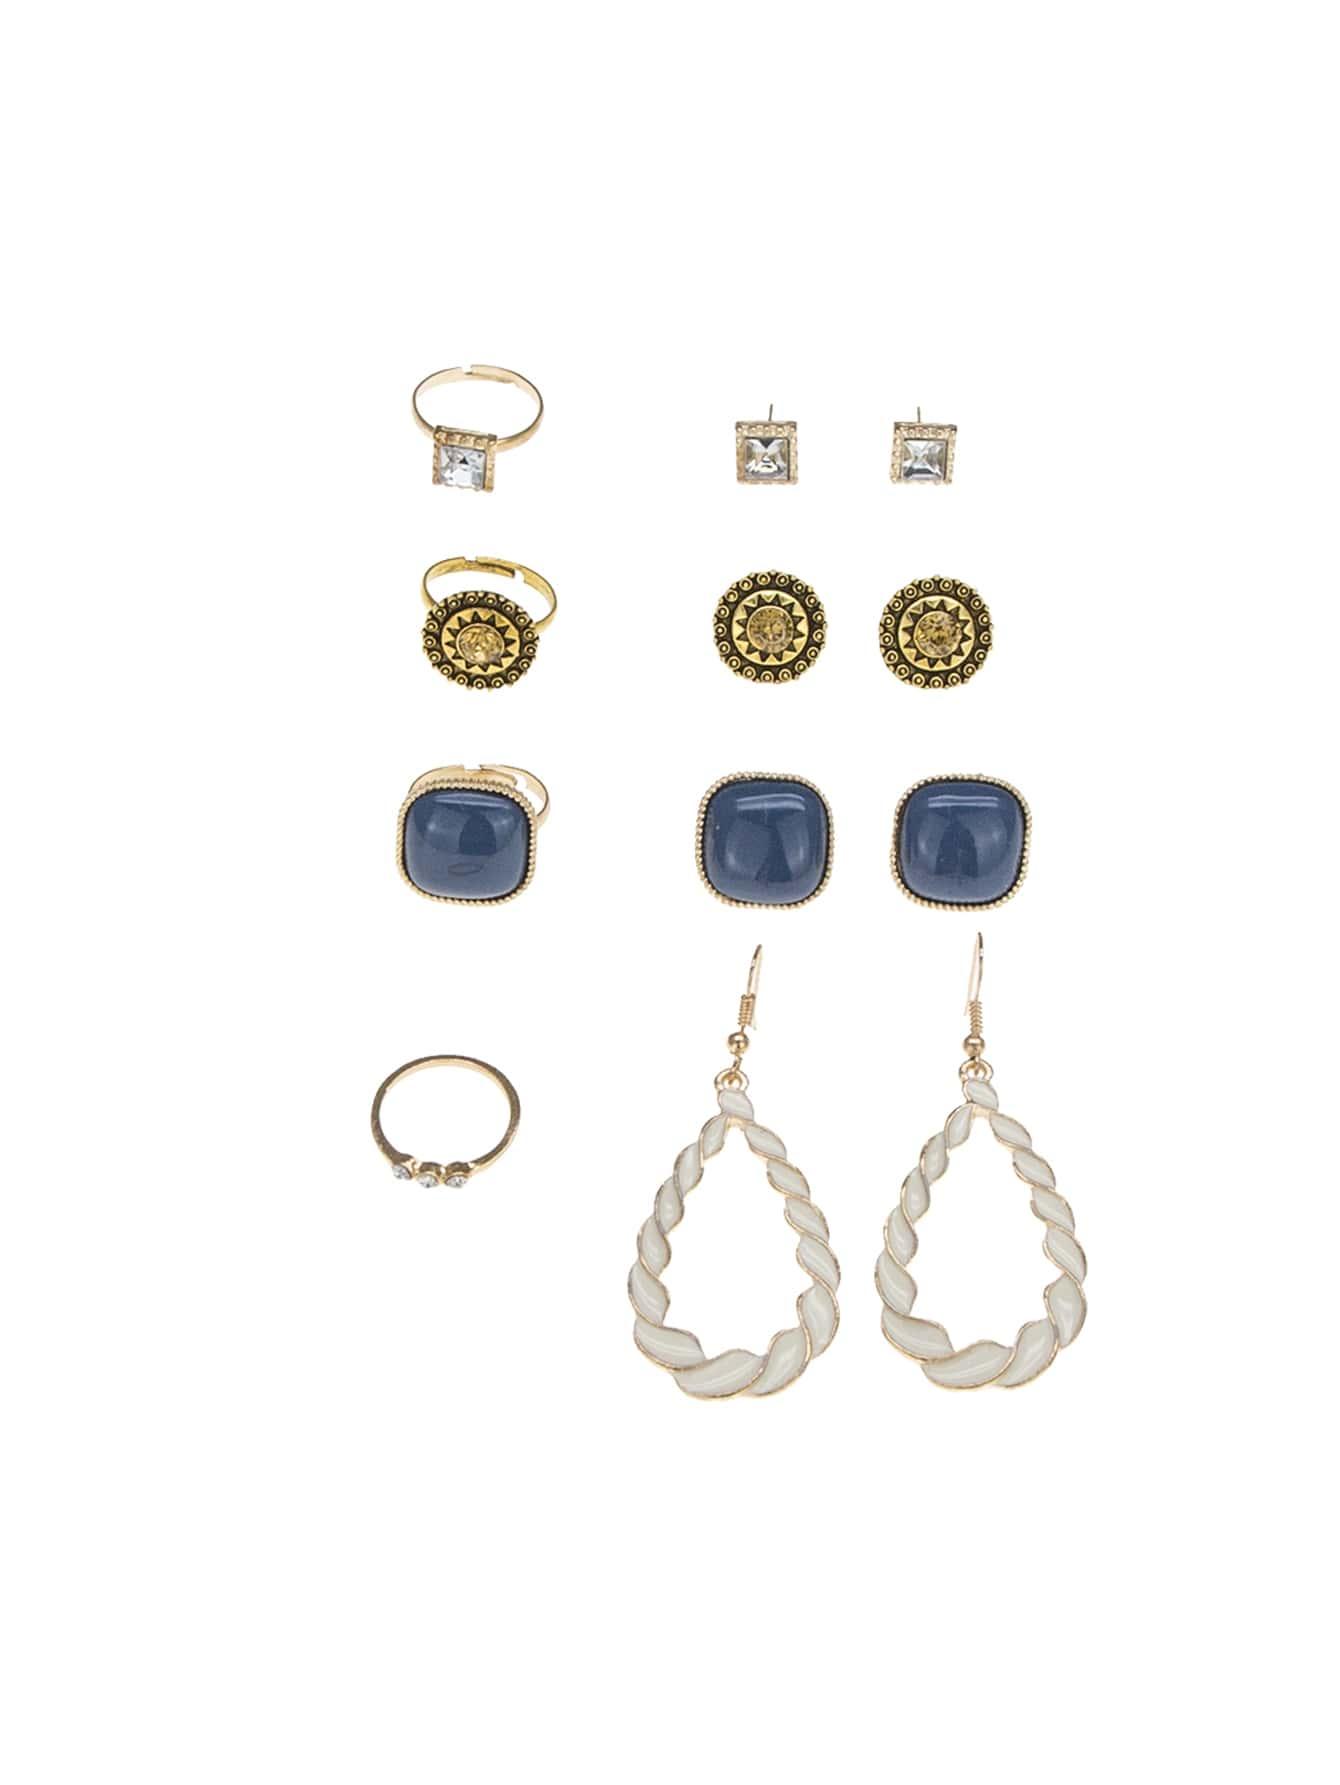 Rhinestone Detail Earrings 4pairs & Ring Set 4pcs